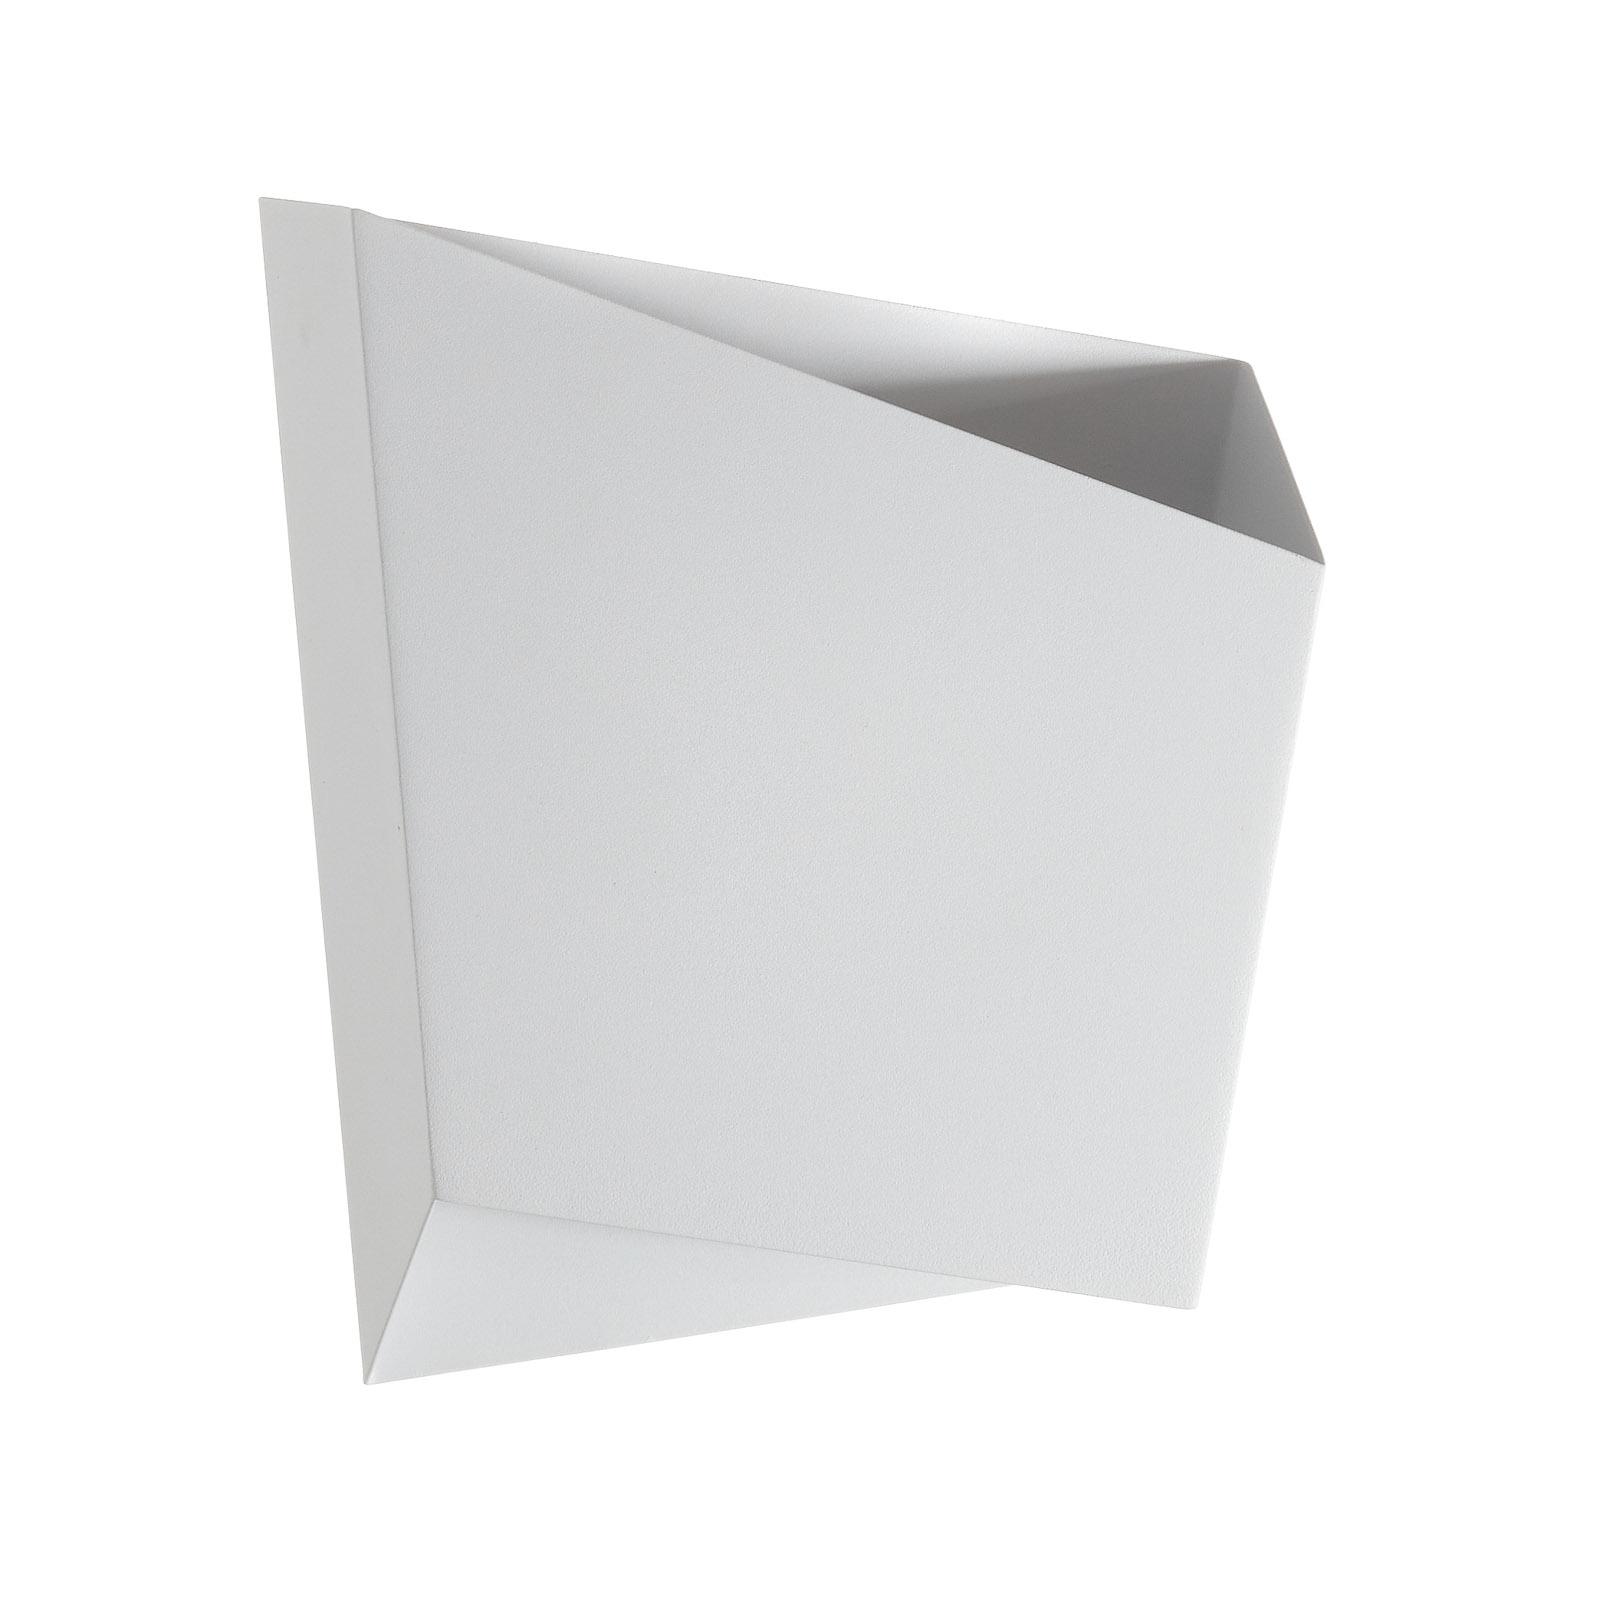 Wandleuchte Asimetric aus Stahl, weiß